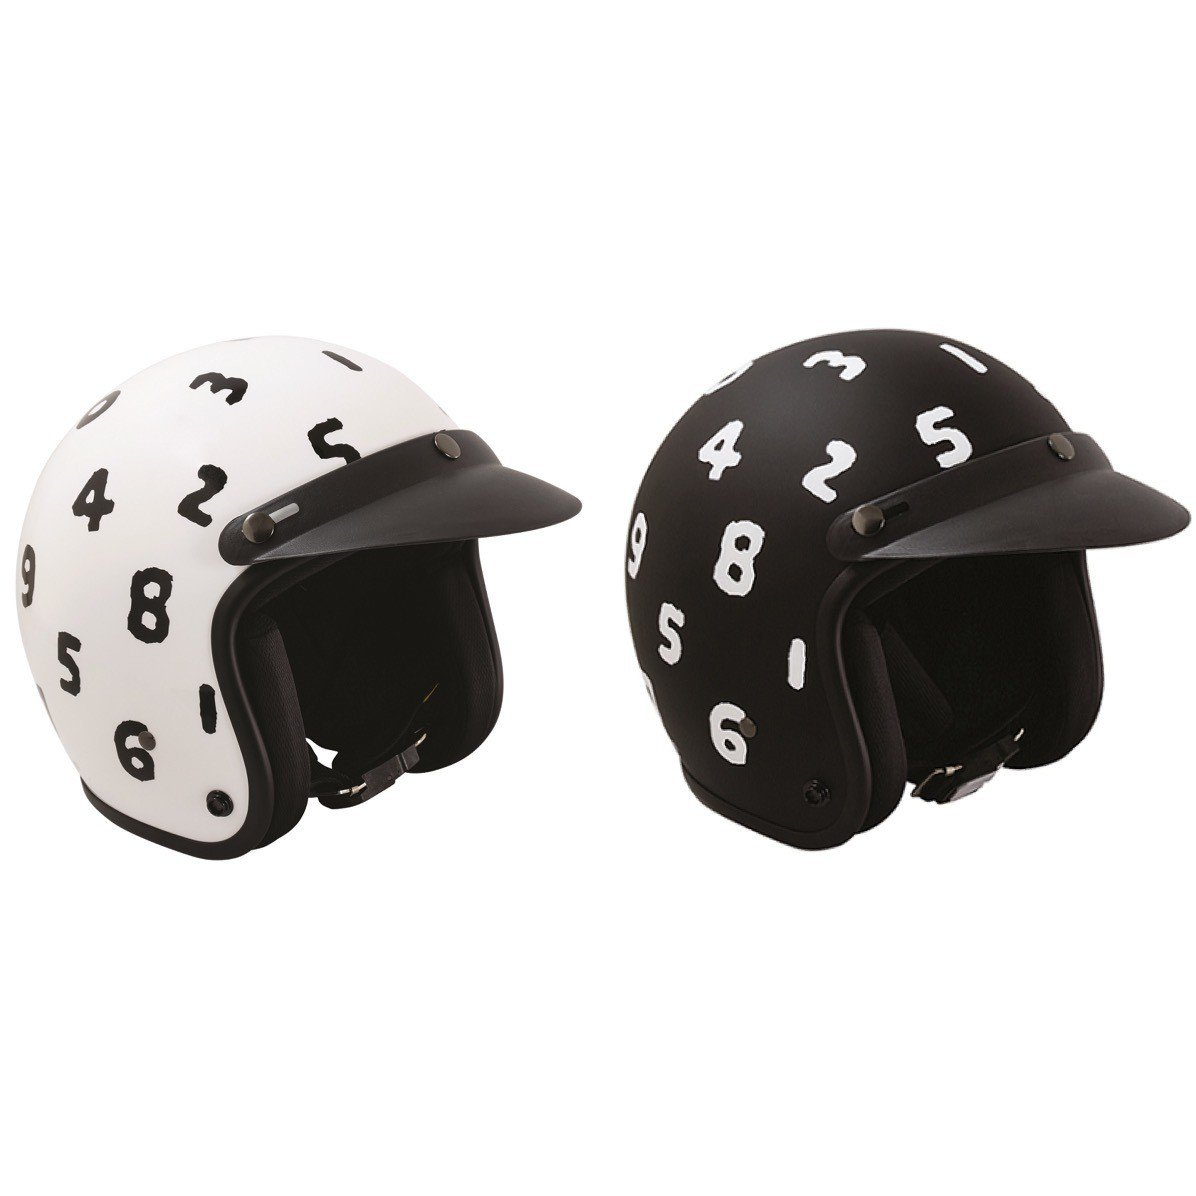 SOU‧SOU與誠品書店合作獨家推出台灣限定版安全帽,共3款,990元。圖/誠品...